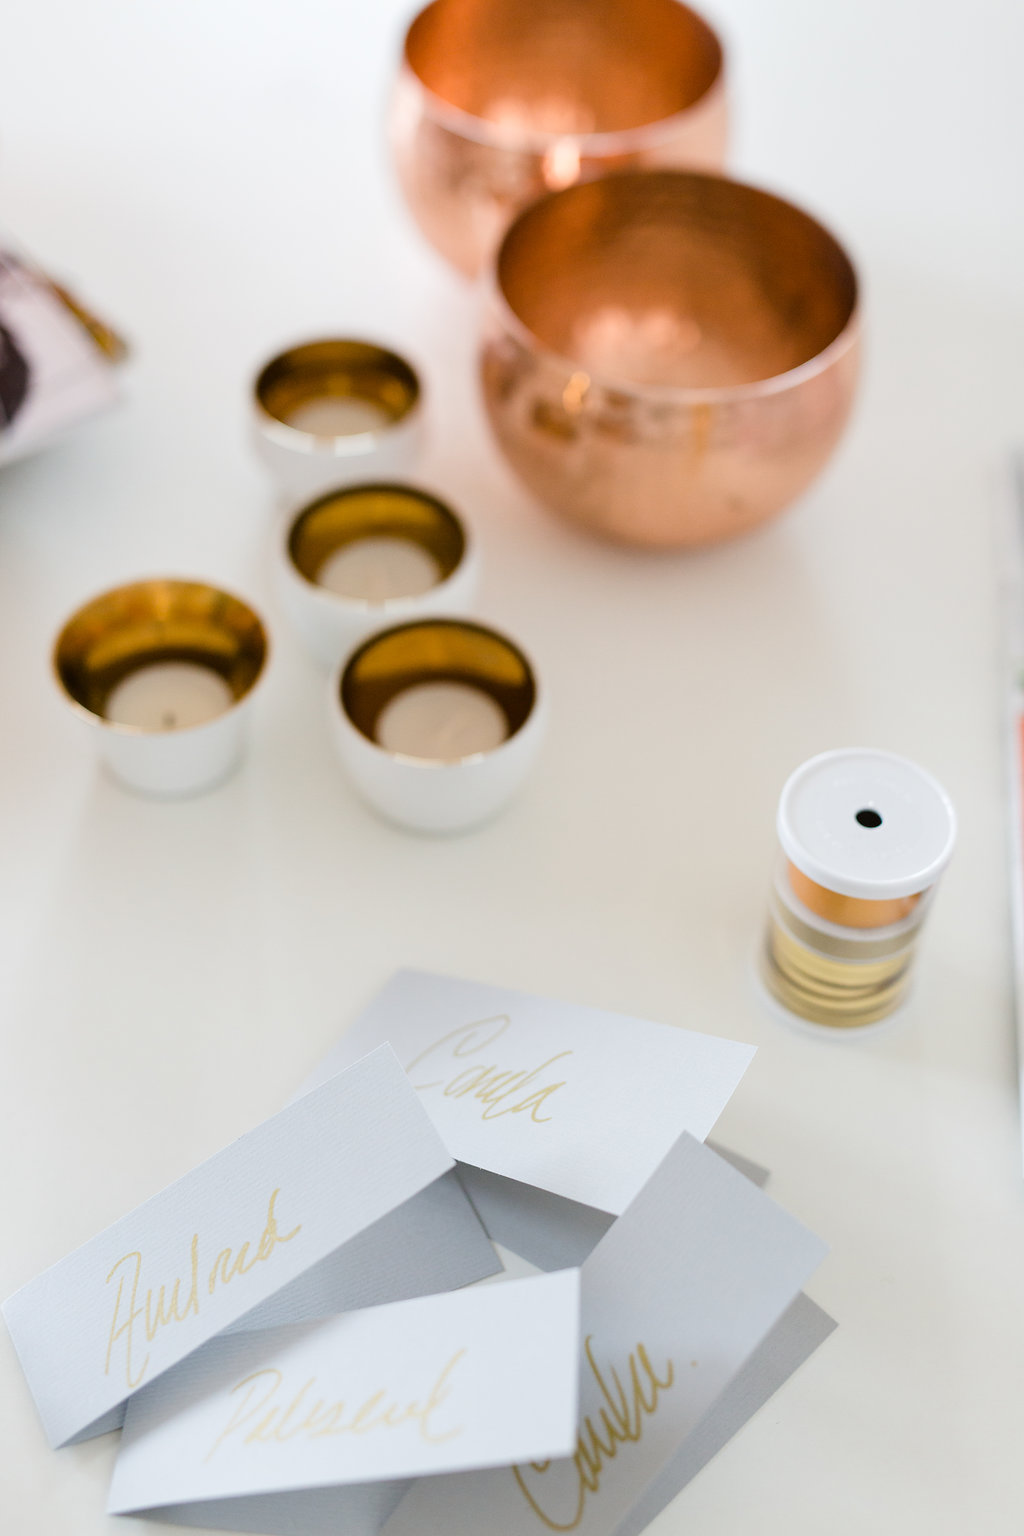 Sofia CM Blog Entrepreneur and Interior Designer Scandinavian Interior blog Zurich